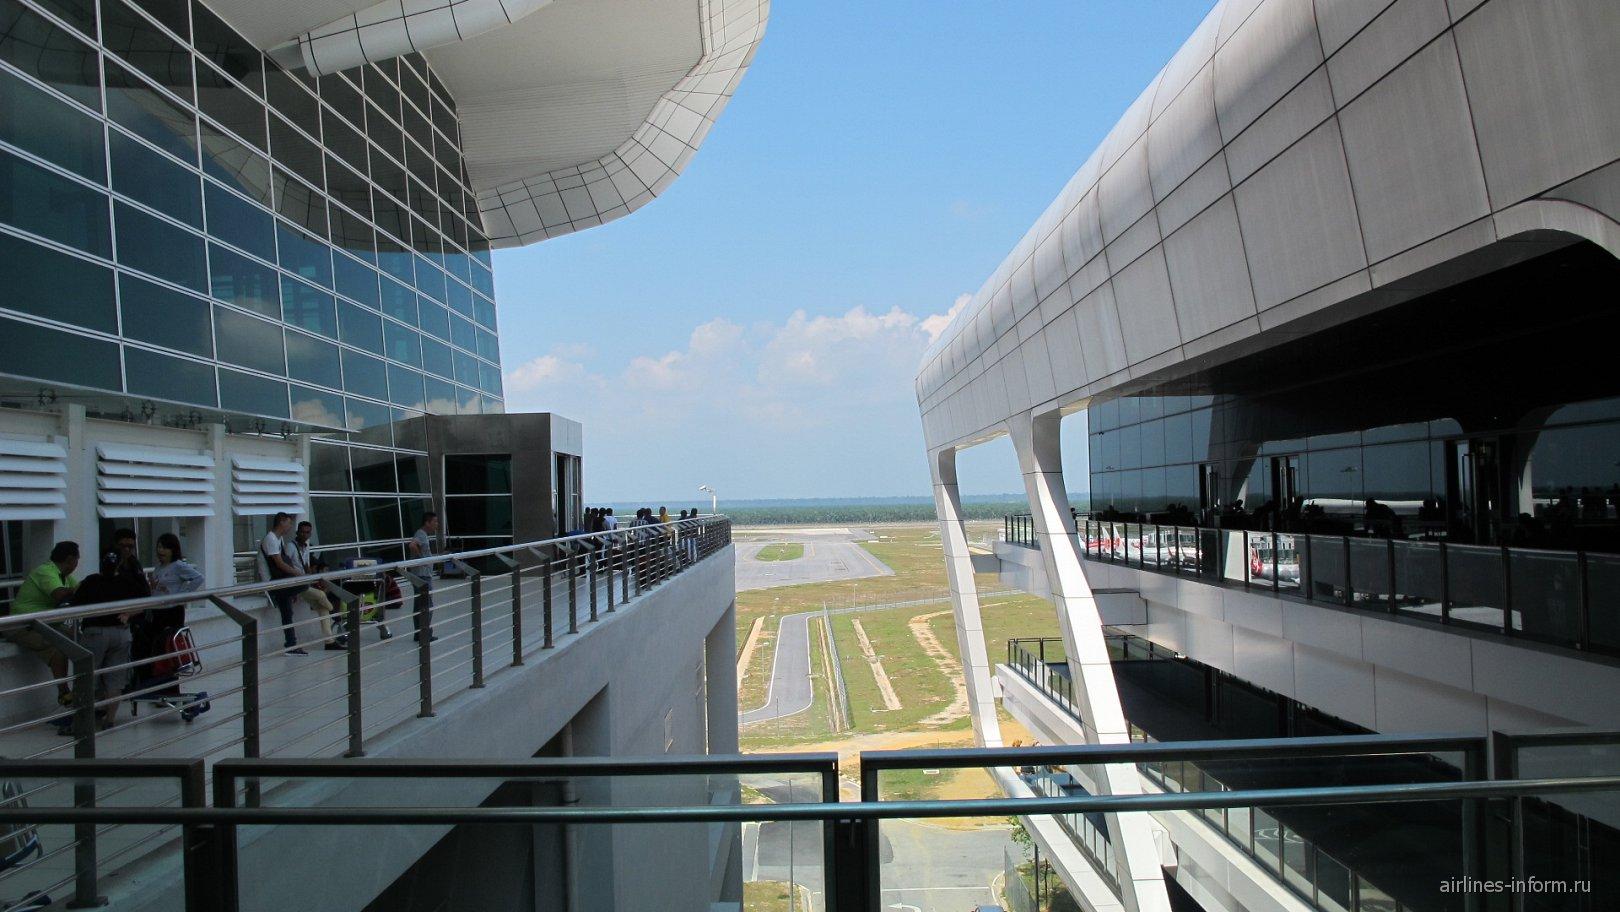 Проход между двумя частями лоукост-терминала KLIA2 аэропорта Куала-Лумпур